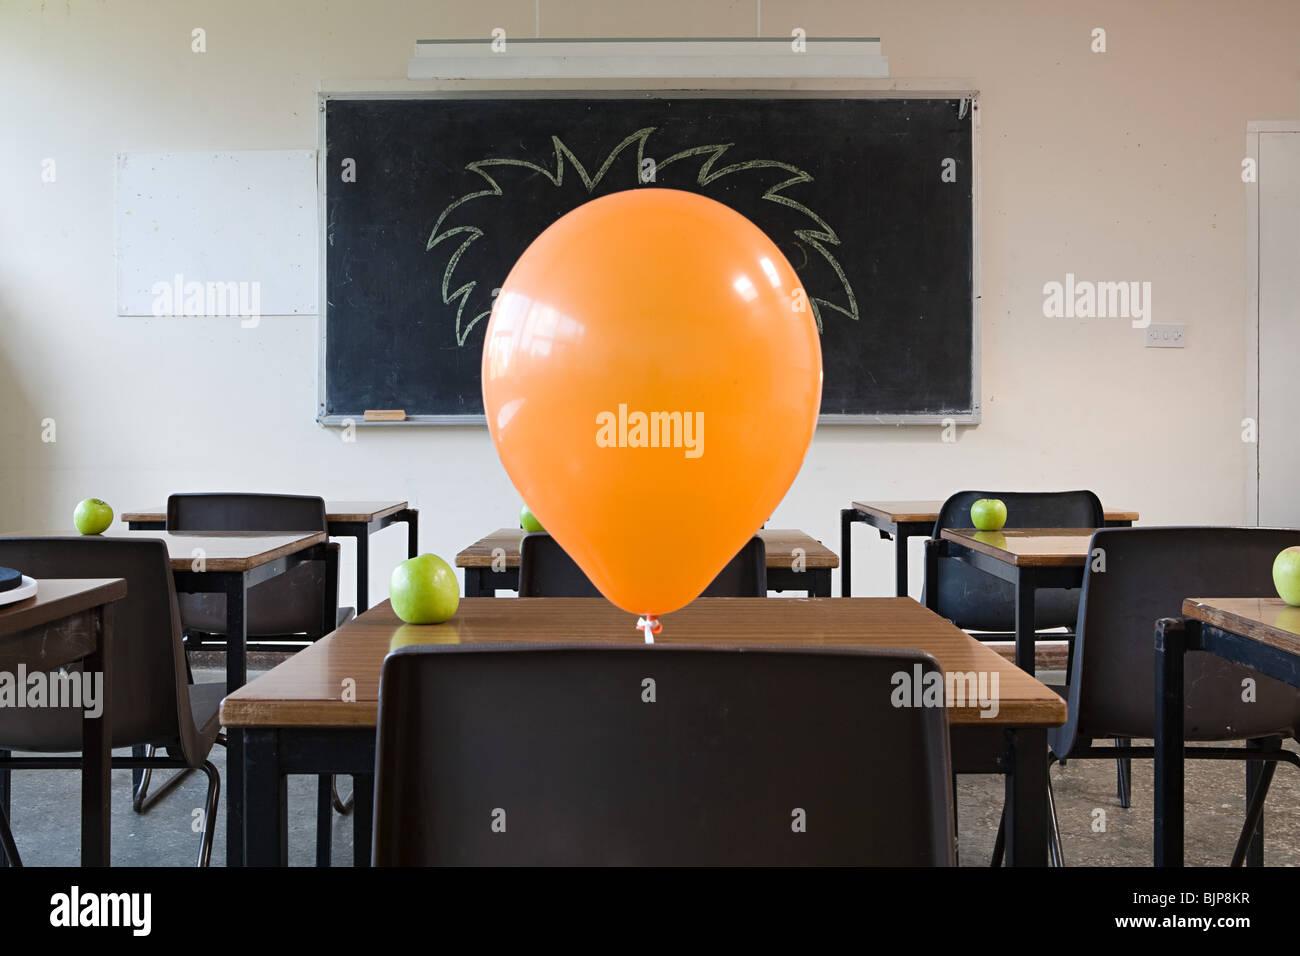 Balloon in classroom - Stock Image